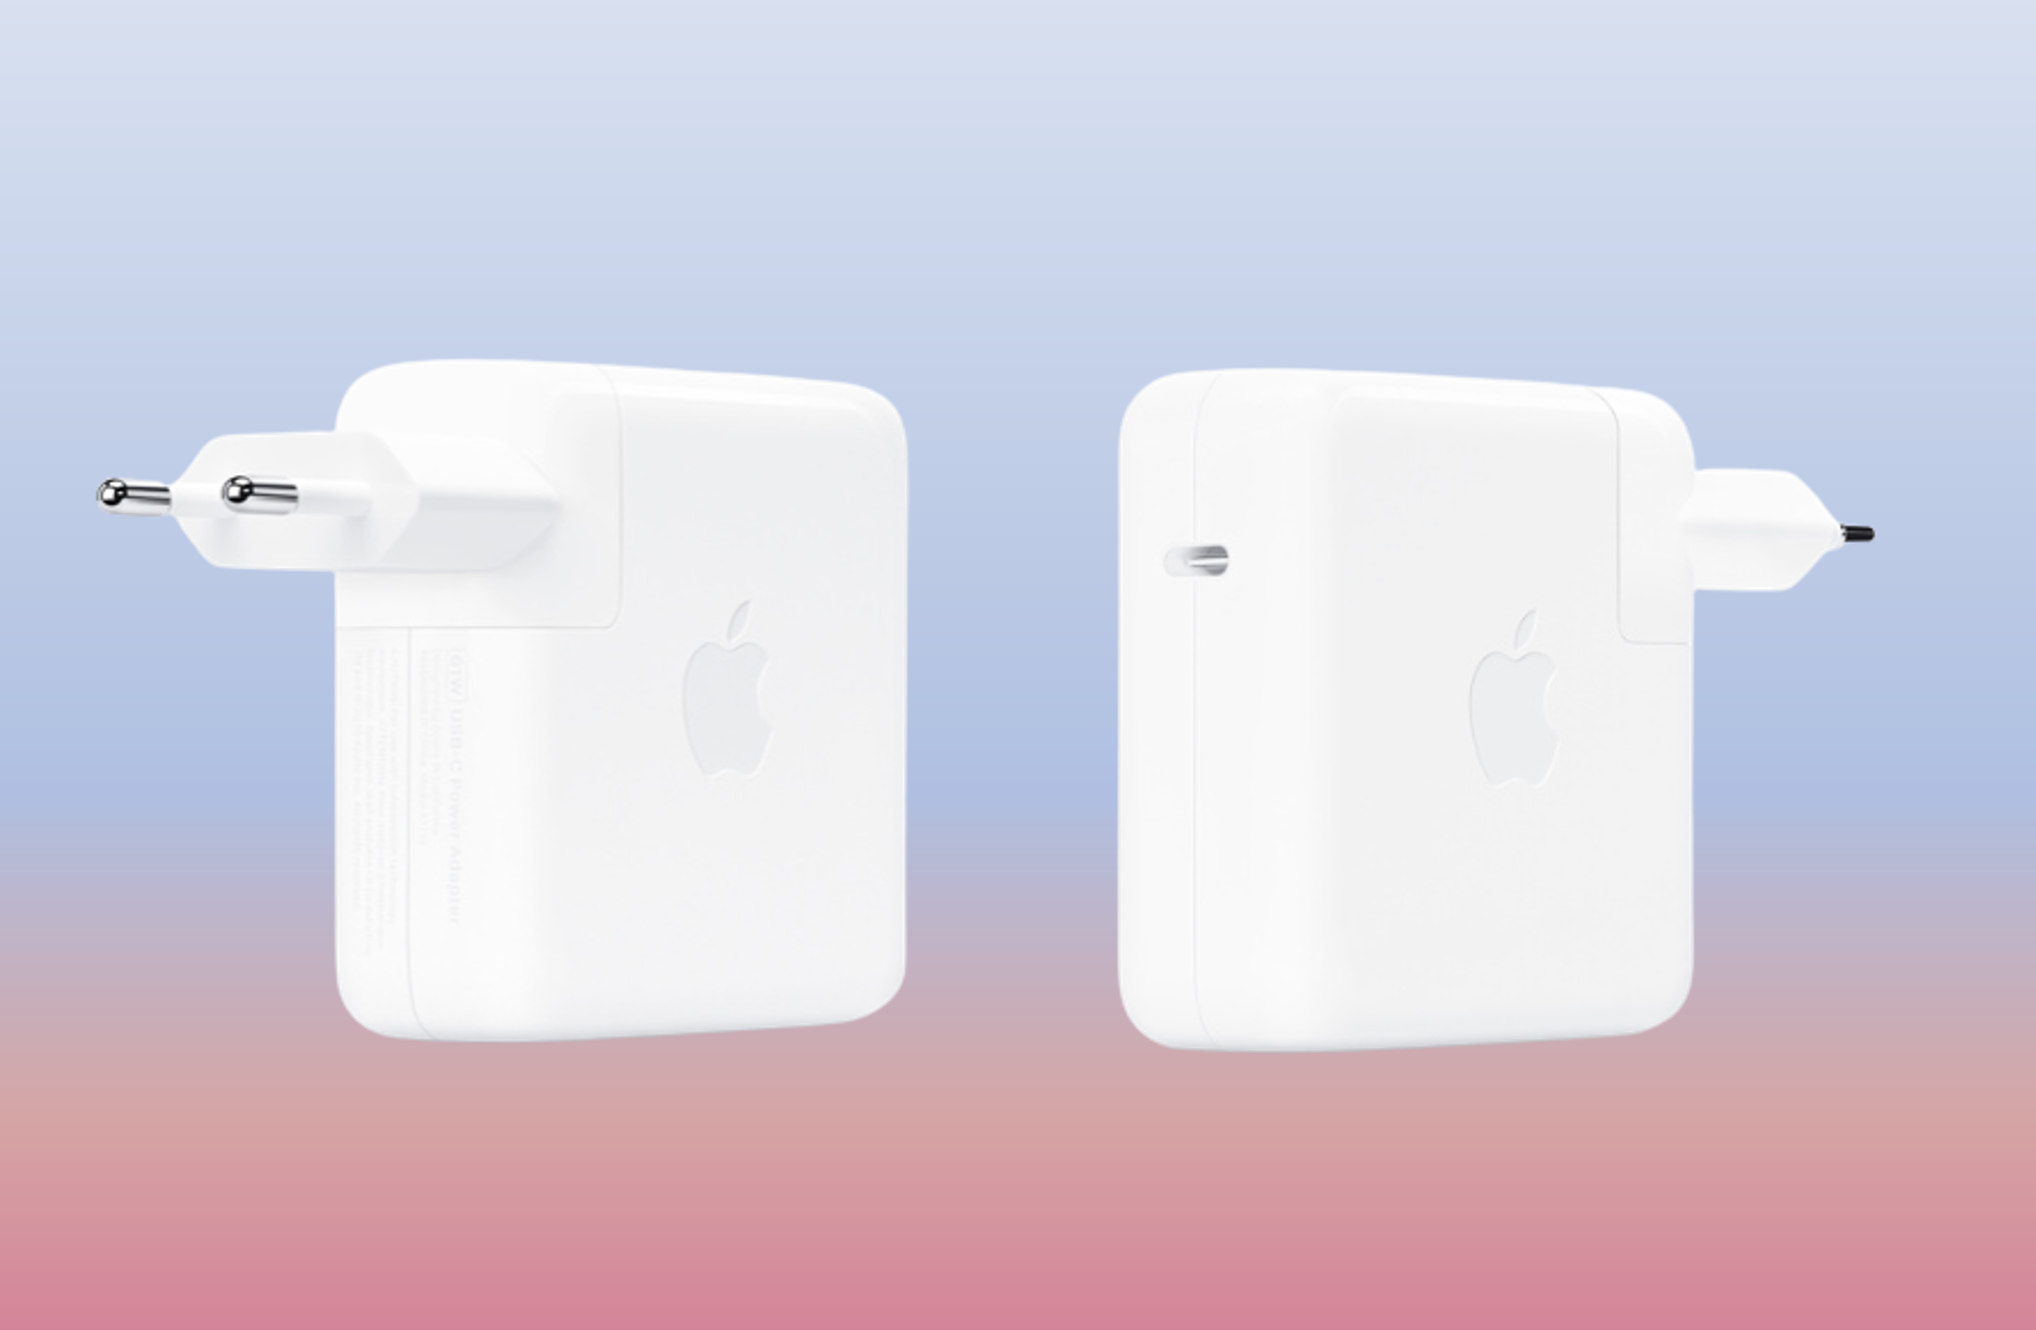 Adaptador de corrente Apple USB-C | Fonte: Apple